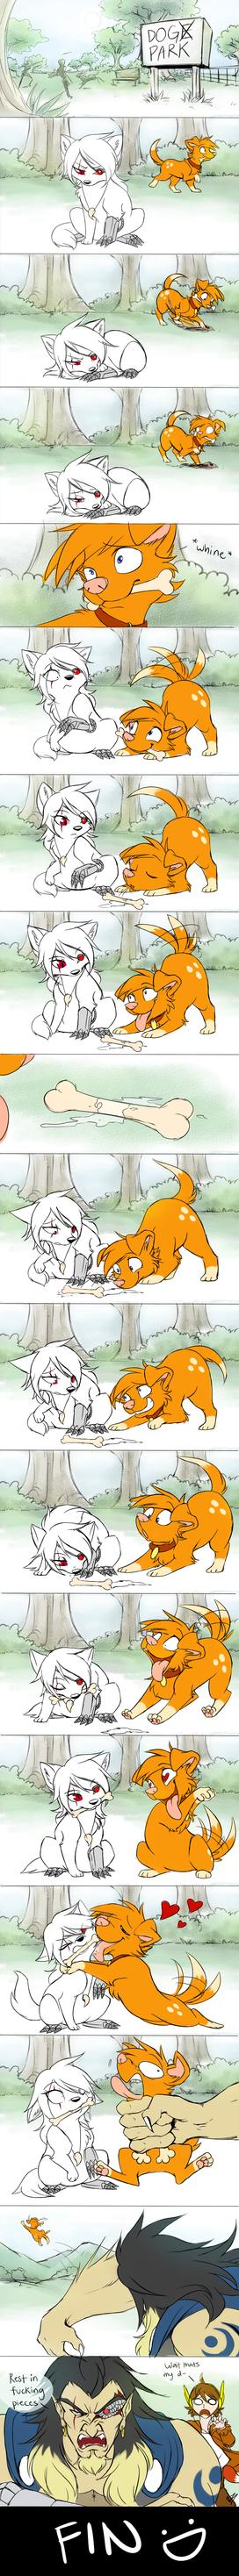 OTP Part 3: Animal Edition by DragginCat